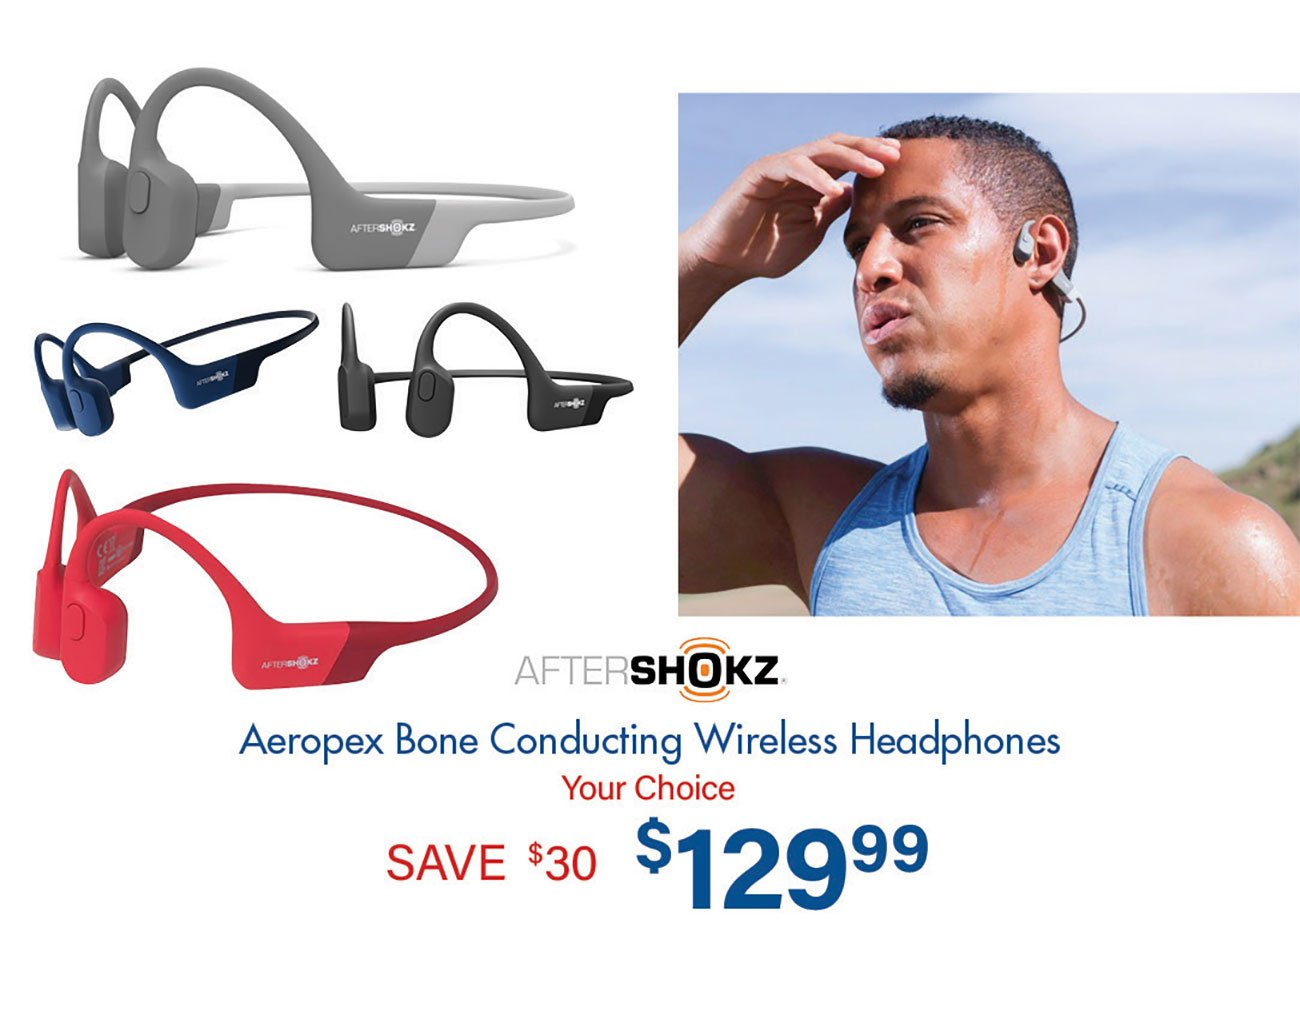 Aftershokz-Aeropex-Bone-Conducting-Headphones